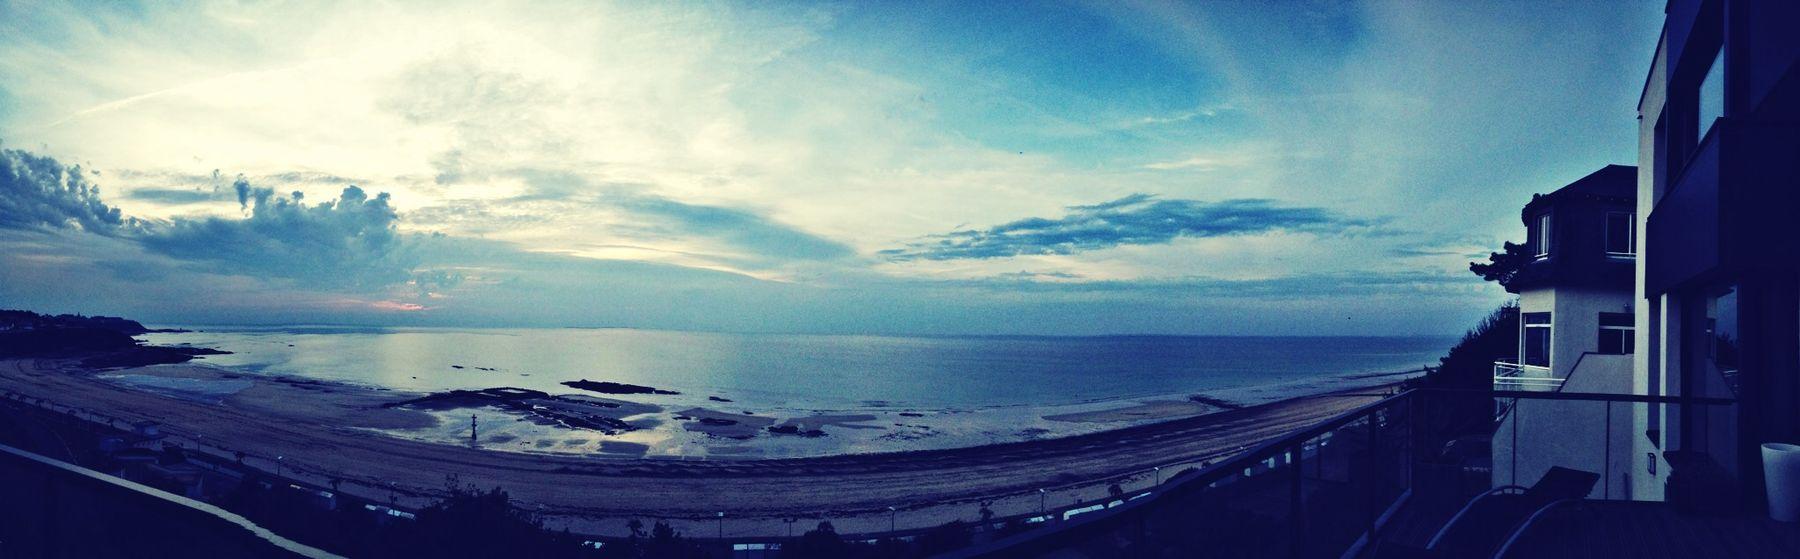 Sea Landscape Beachphotography